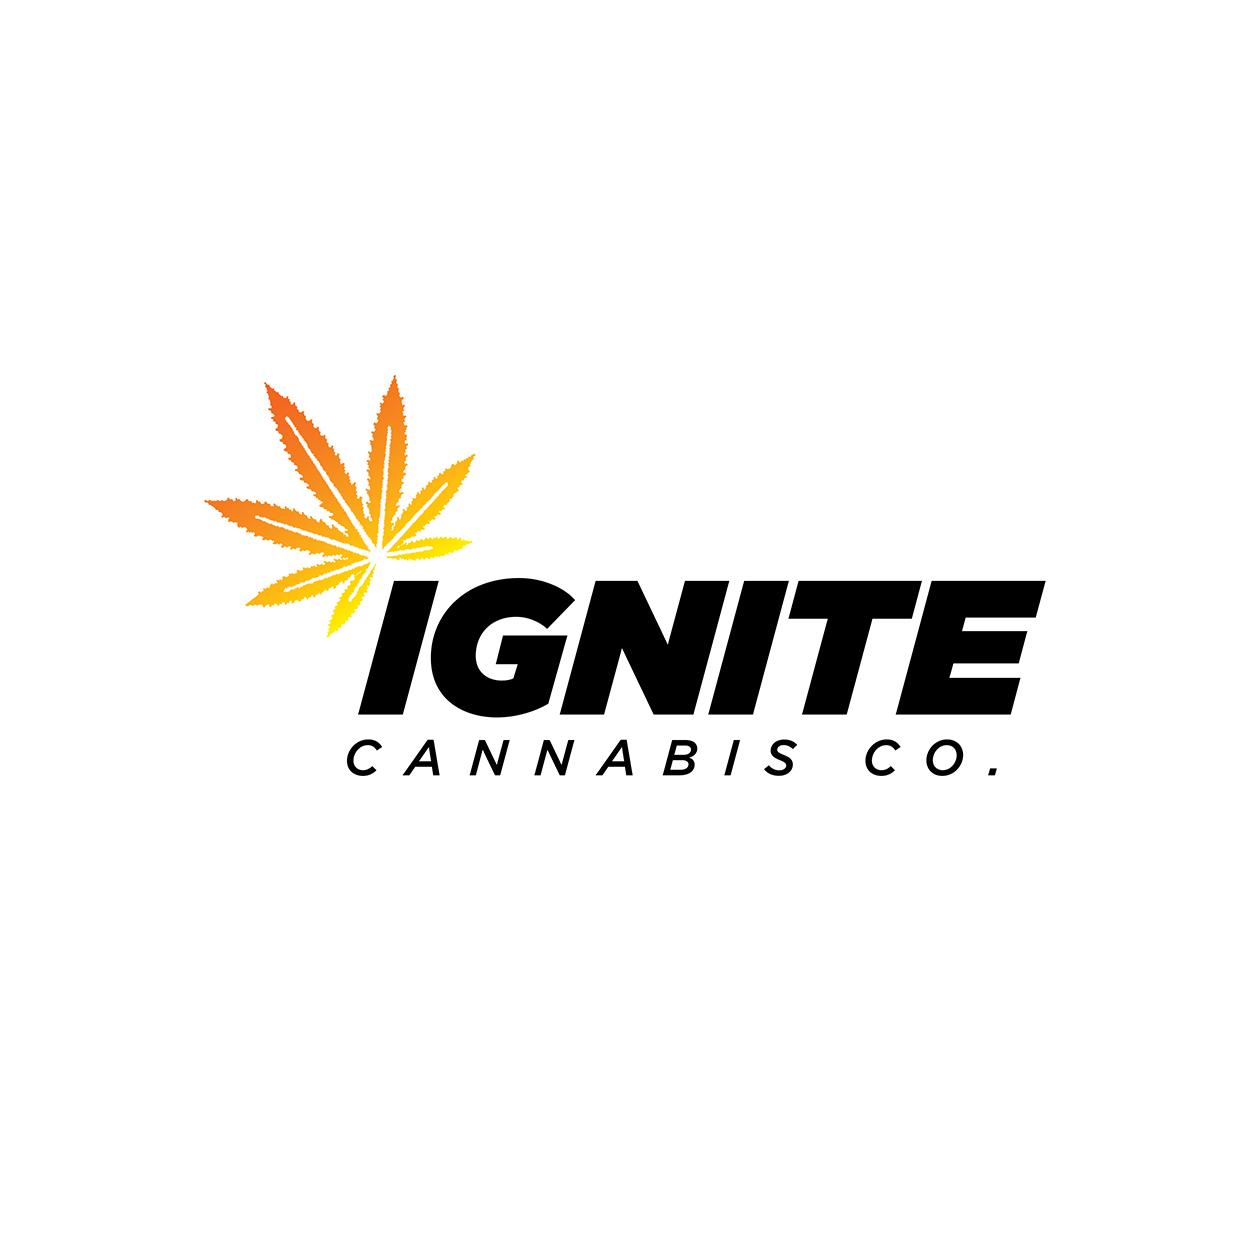 Ignite Cannabis Co.